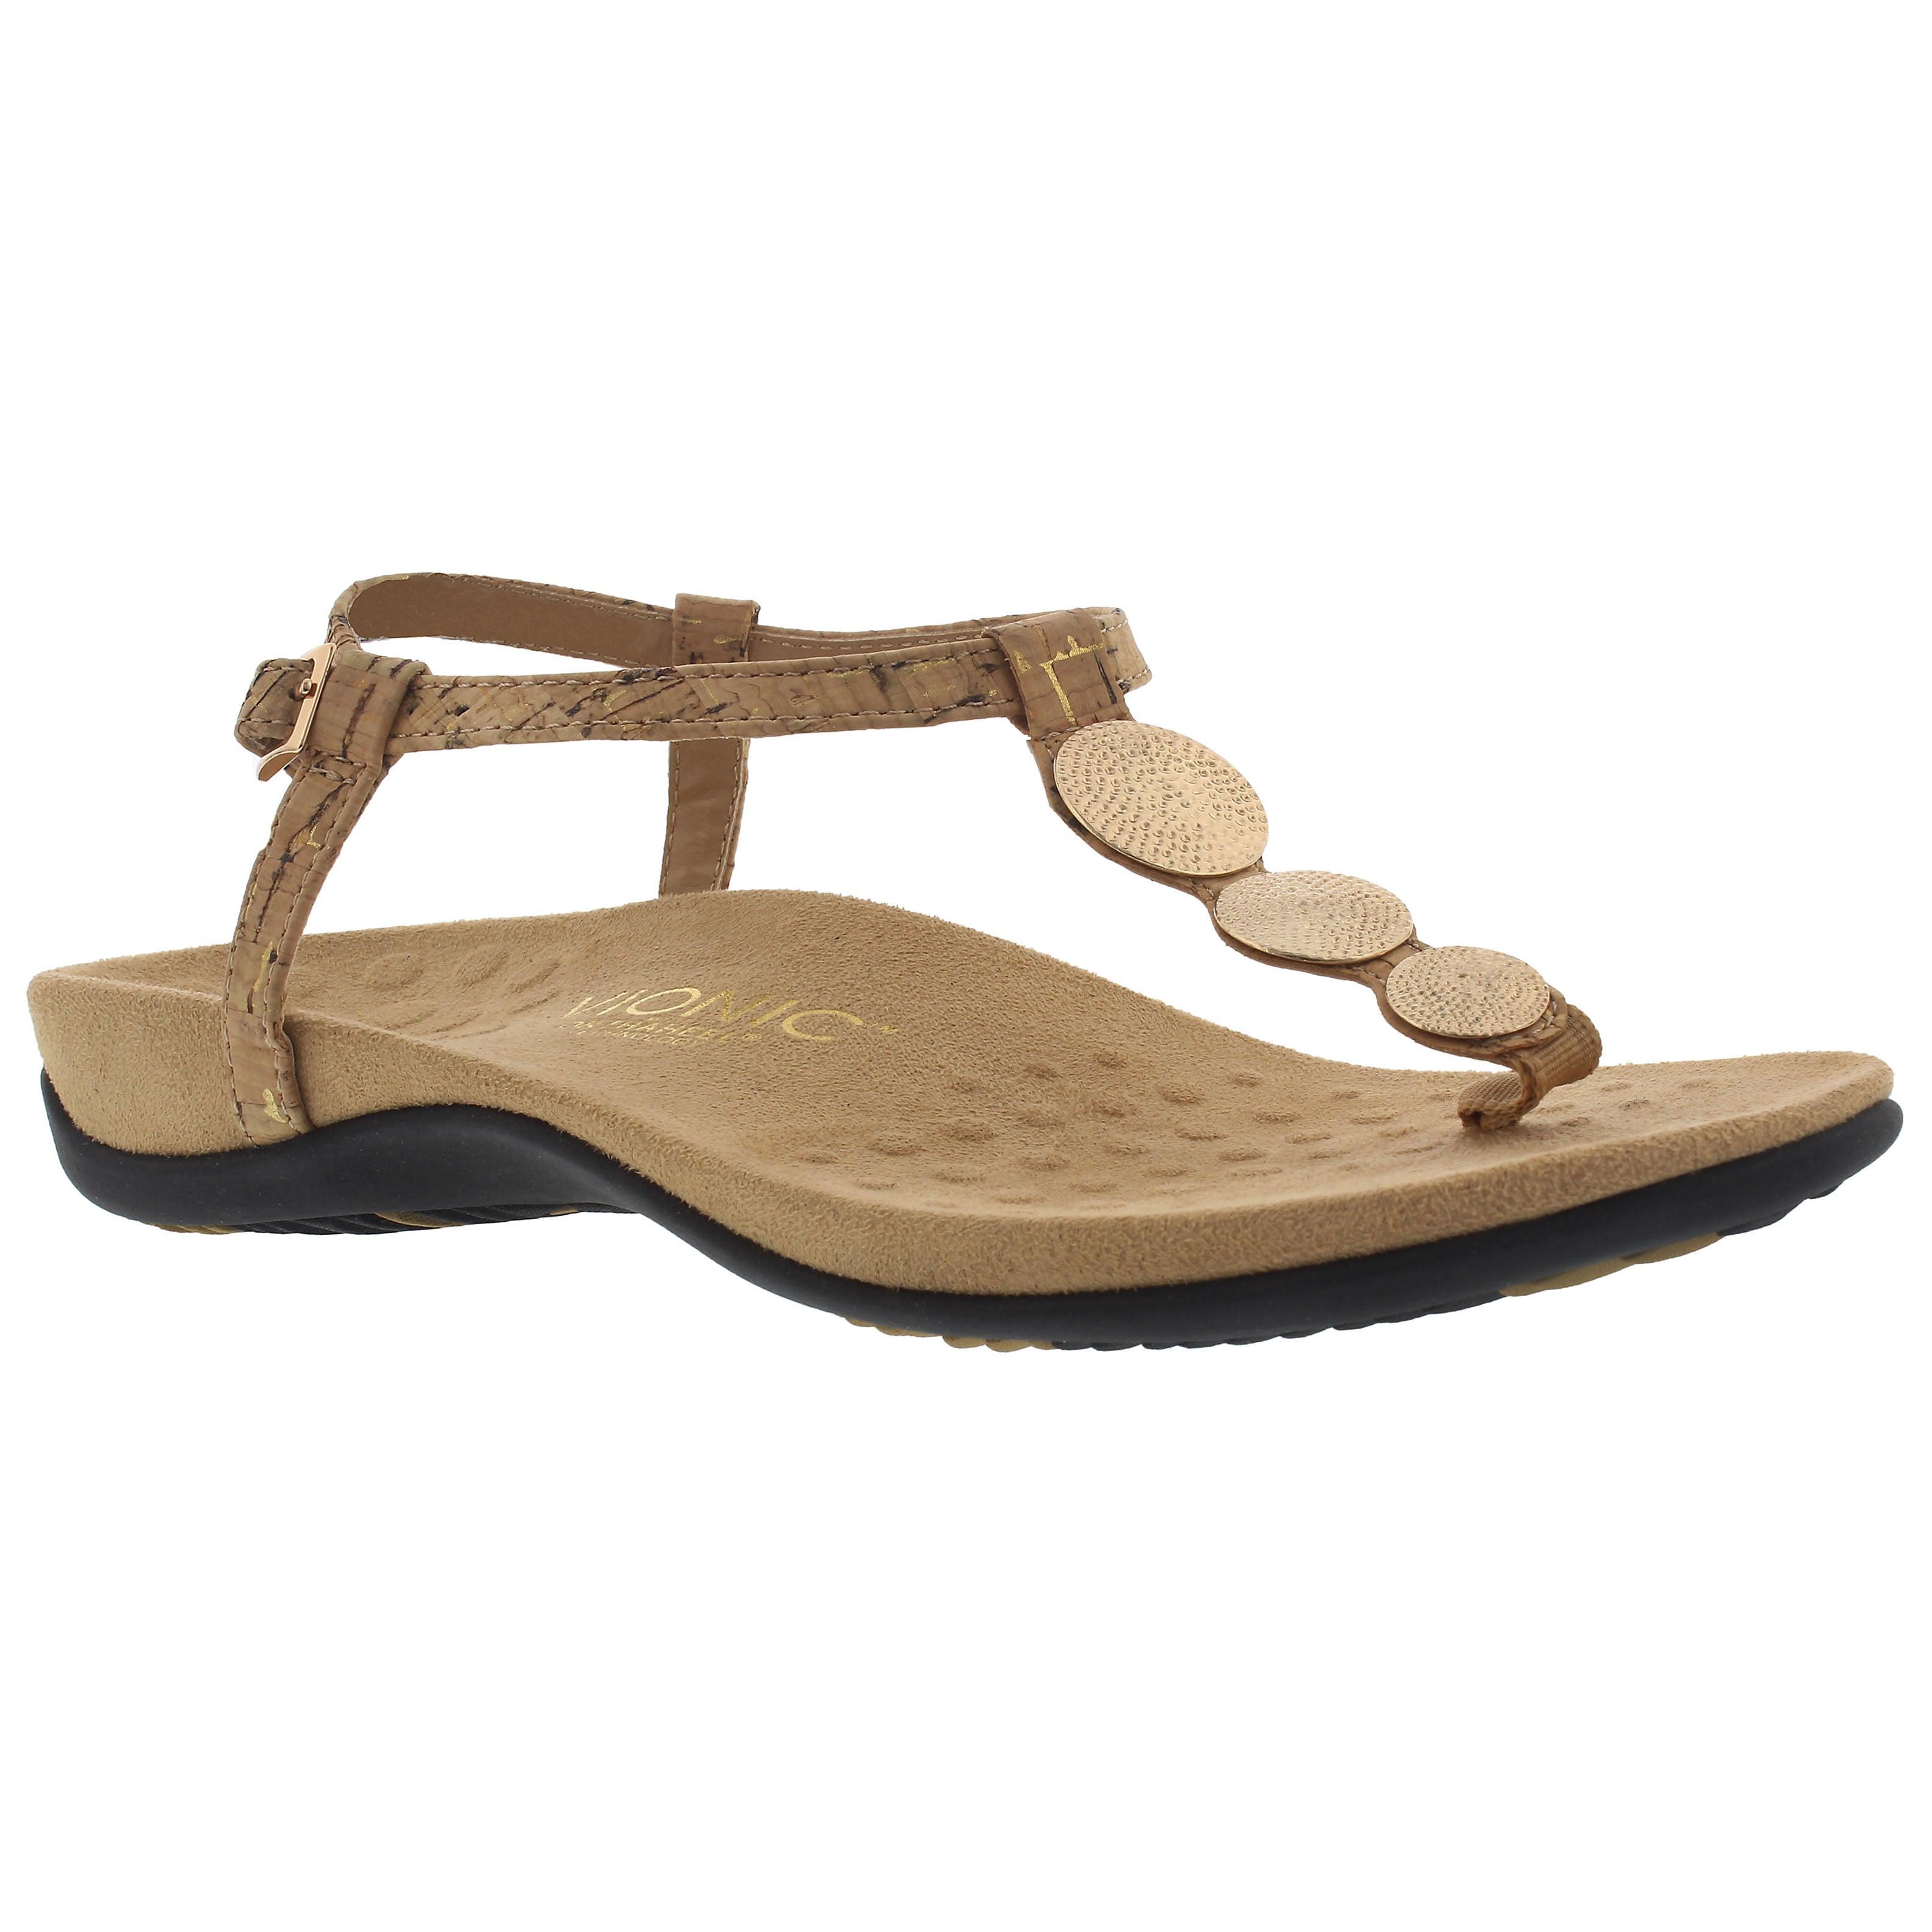 Sandale tong LIZBETH, or, femmes